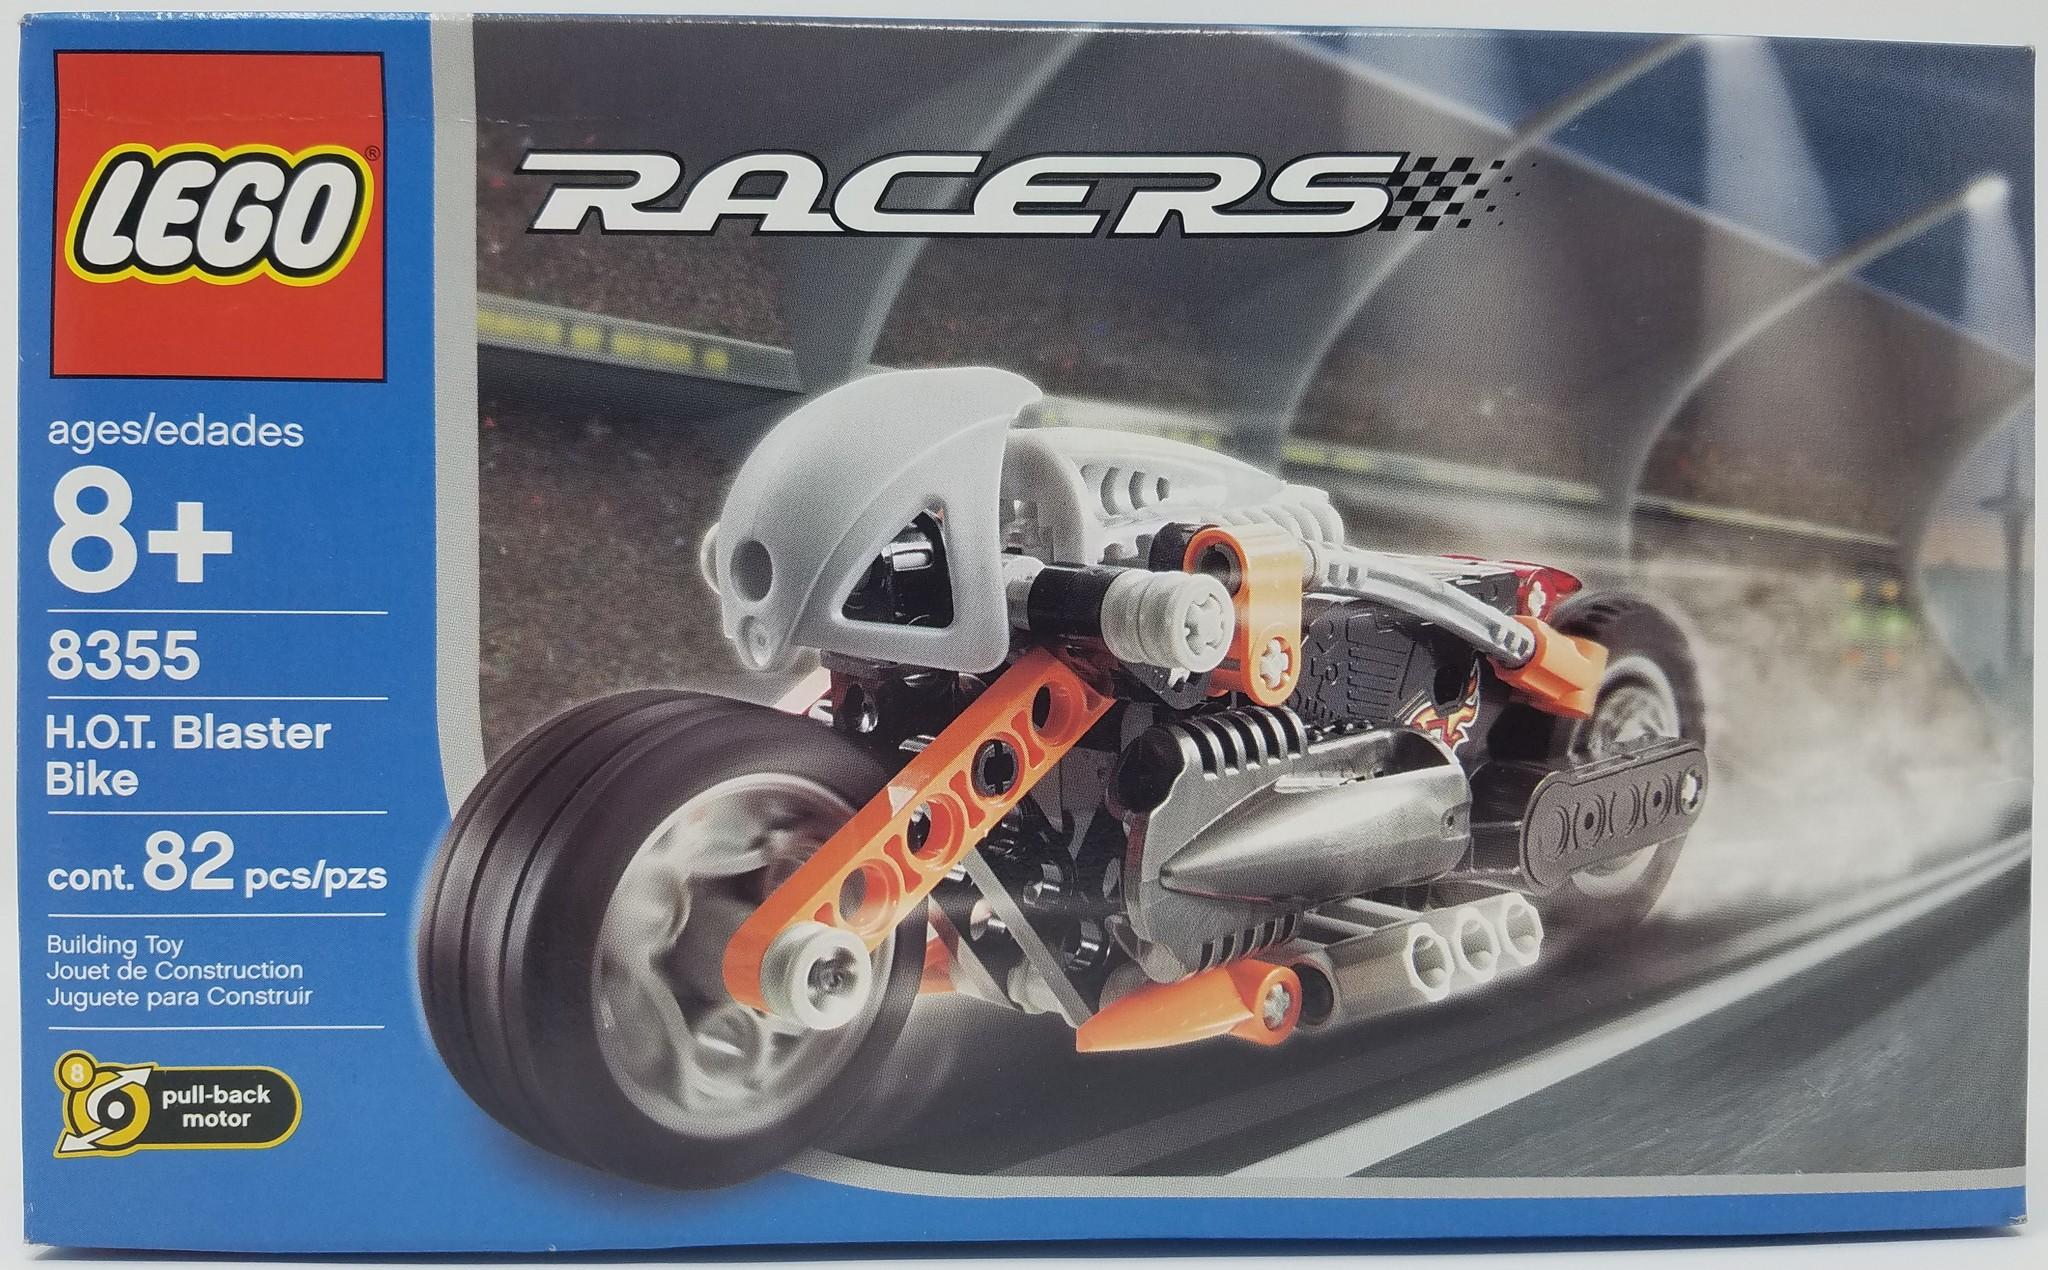 LEGO LEGO #8355 Racers: H.O.T. Blaster Bike